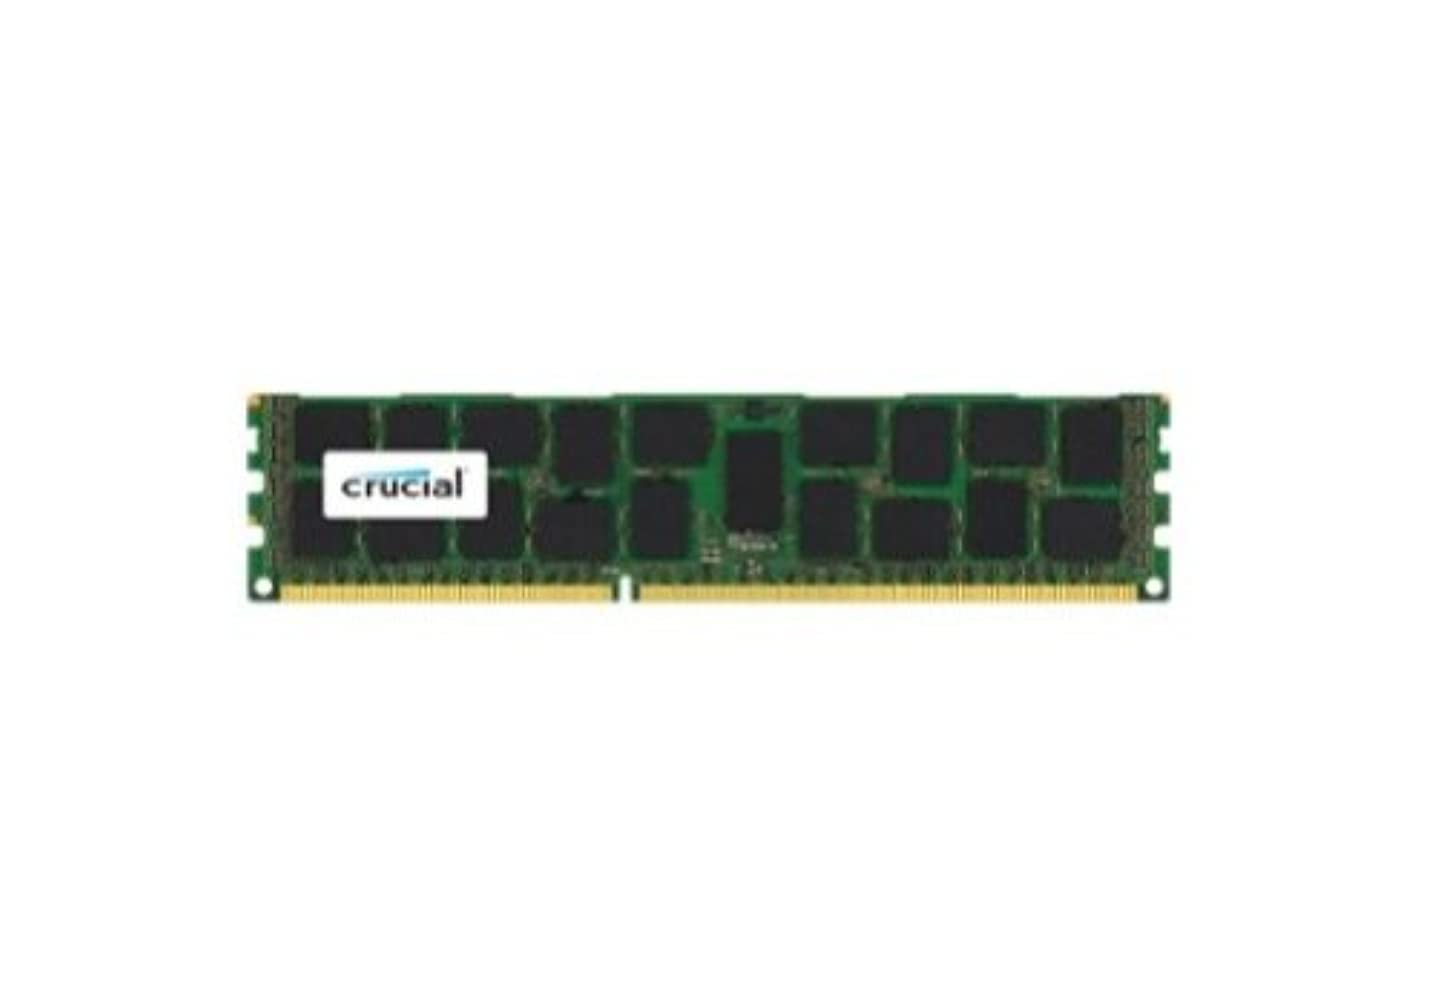 Micron 16GB DDR3-1866MHZ  PC3-14900R 2RX4 REGISTERED ECC REG MEMORY Server Ram